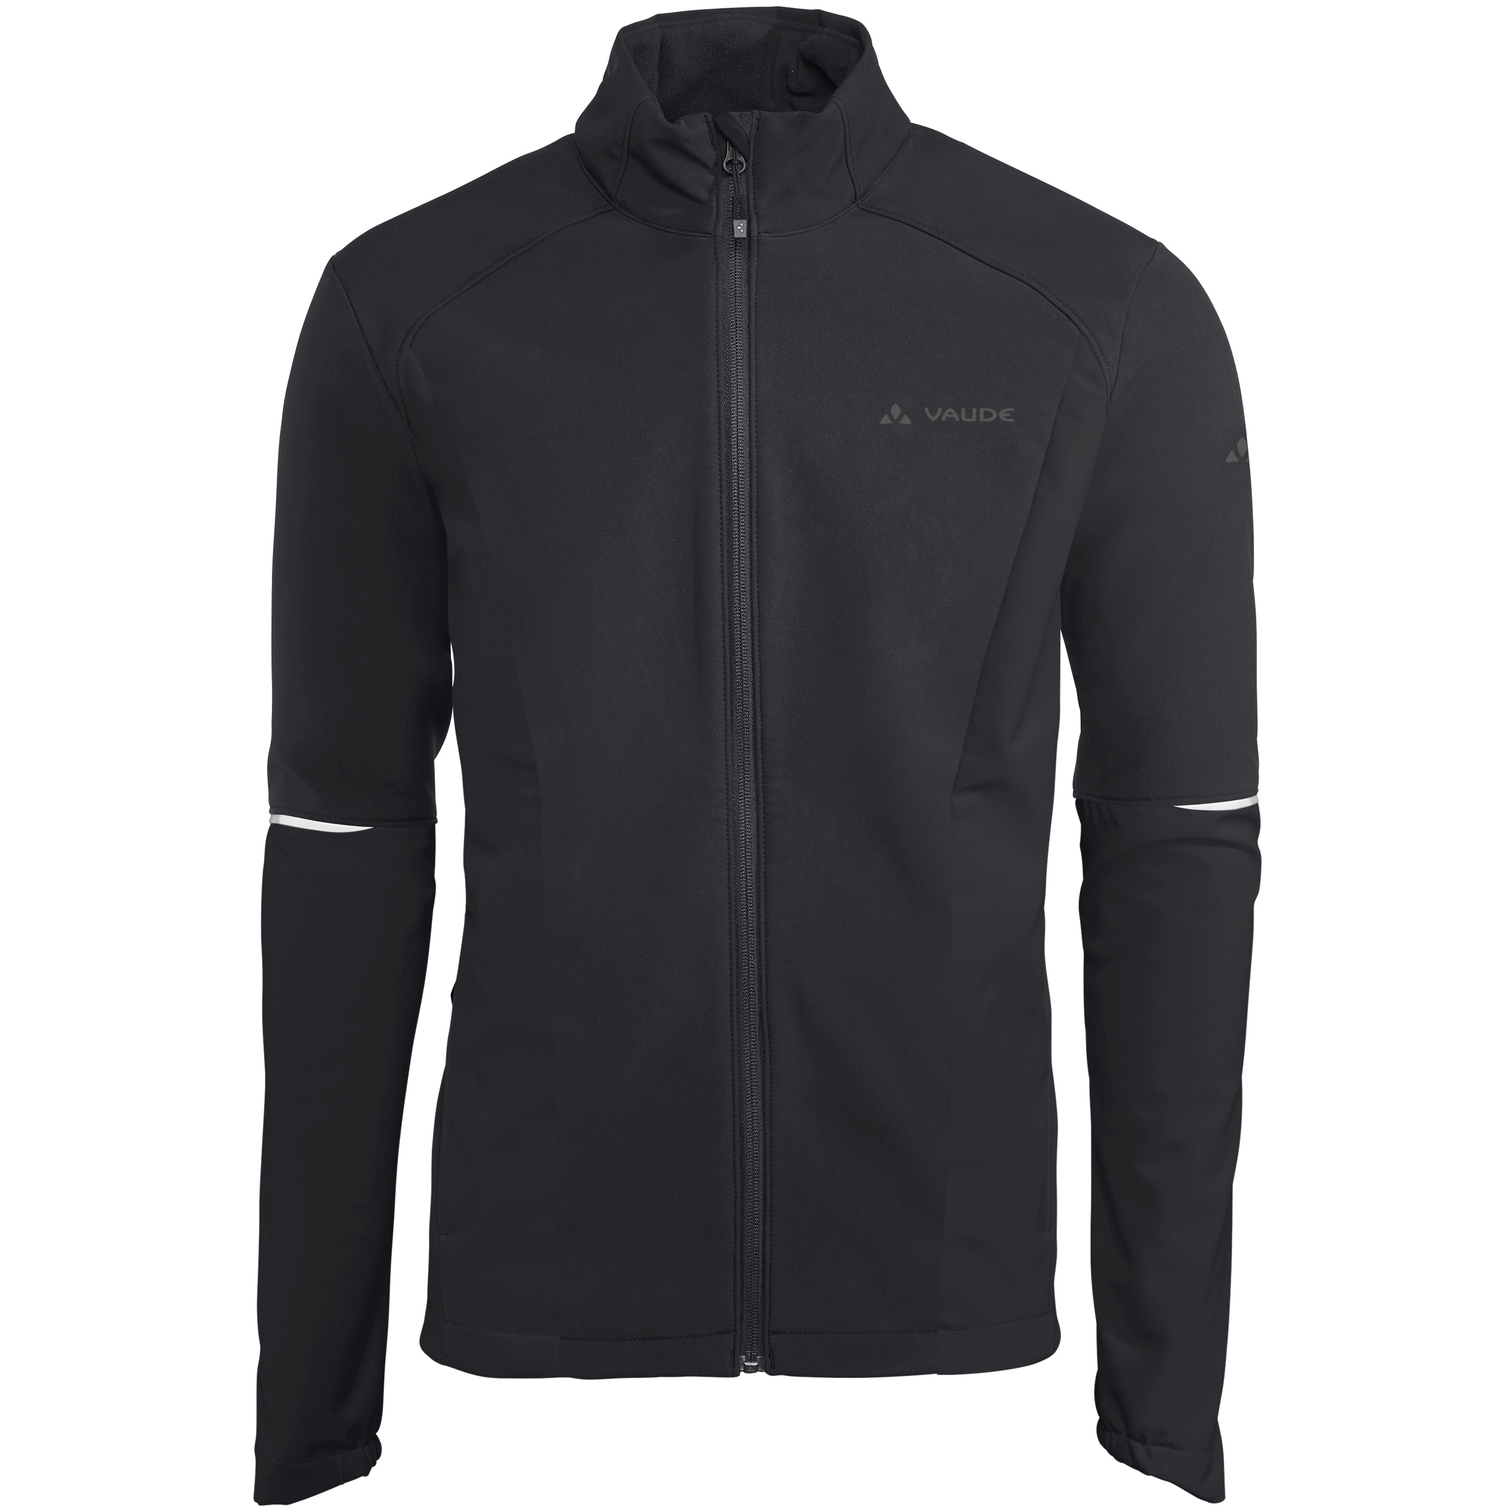 Vaude Men's Wintry Jacket IV - black uni